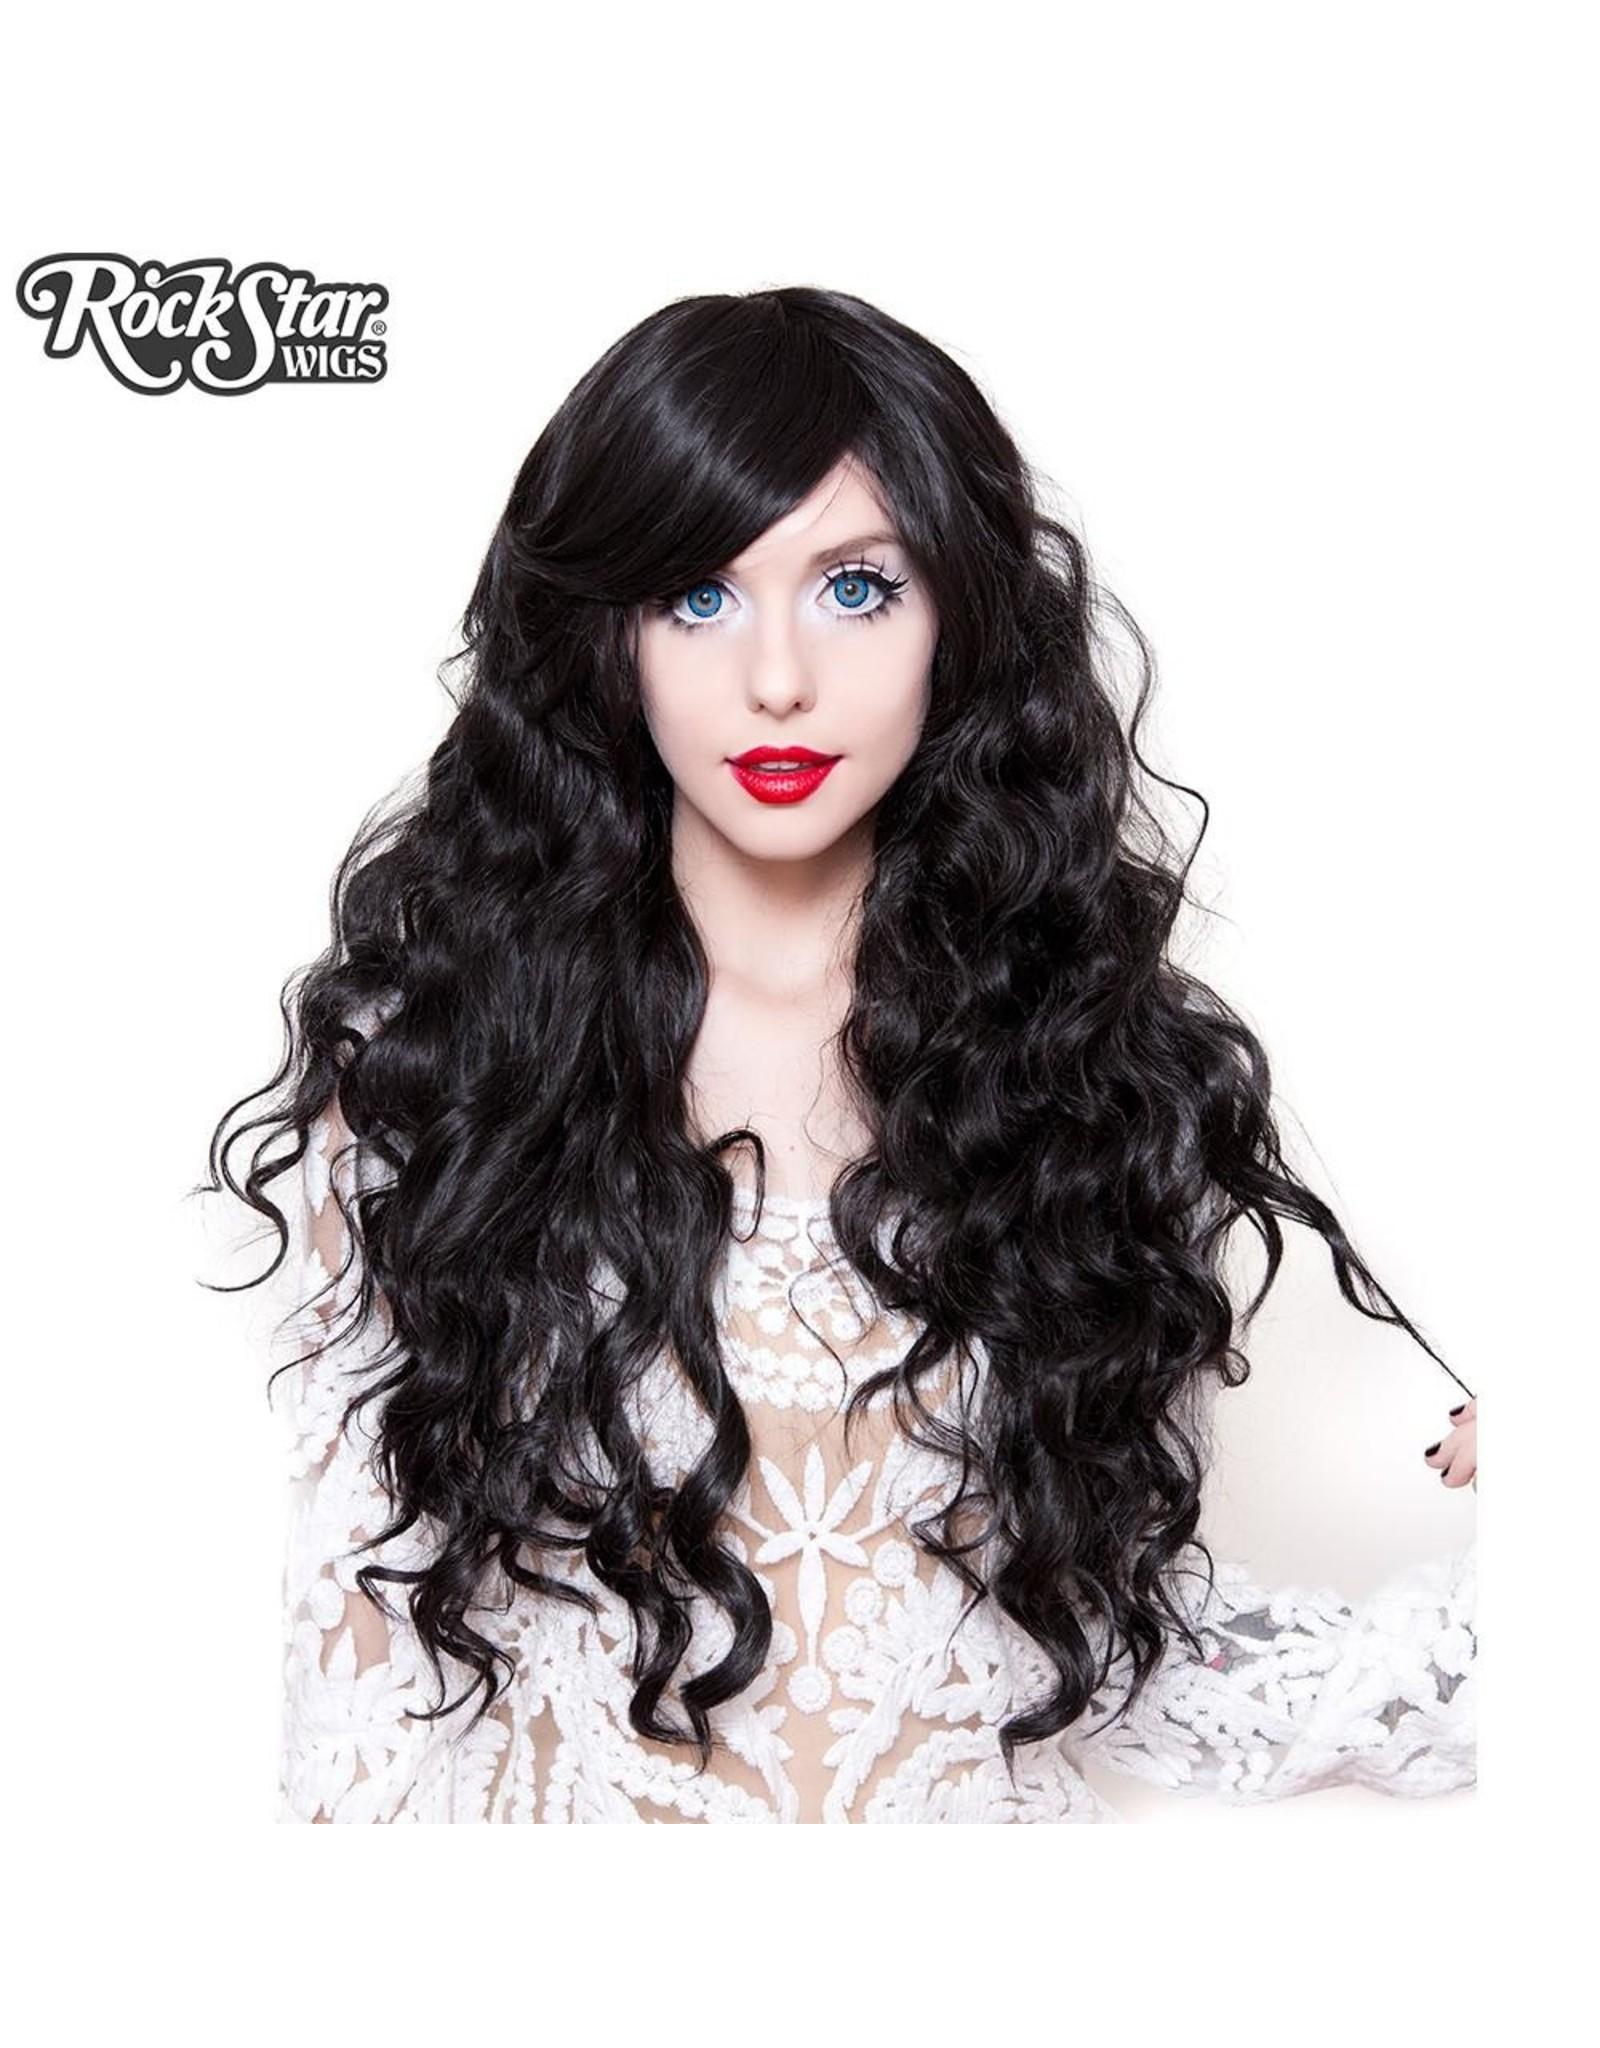 Rockstar Wigs Classic Wavy Gypsy Kiss Wig